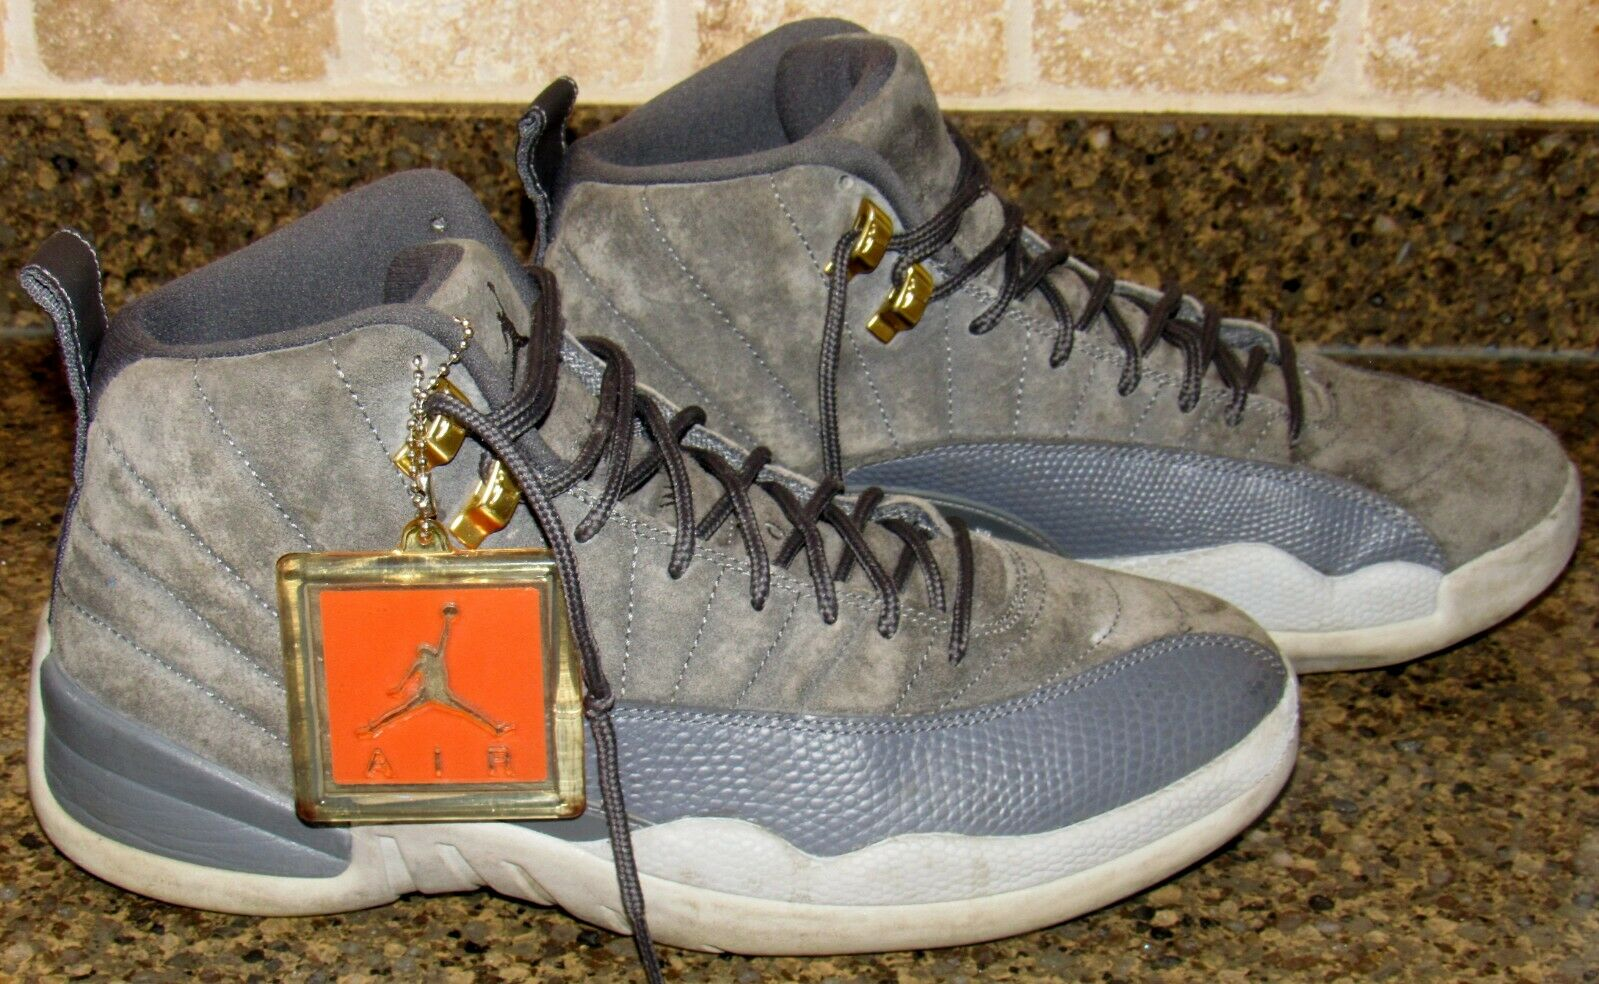 astronauta azufre Paternal  Nike Air Max Jordan 12 Sneakers (130690-005) - Dark Grey/Wolf Grey/Golden  Harvest/Dark Grey, Size 9 for sale online | eBay